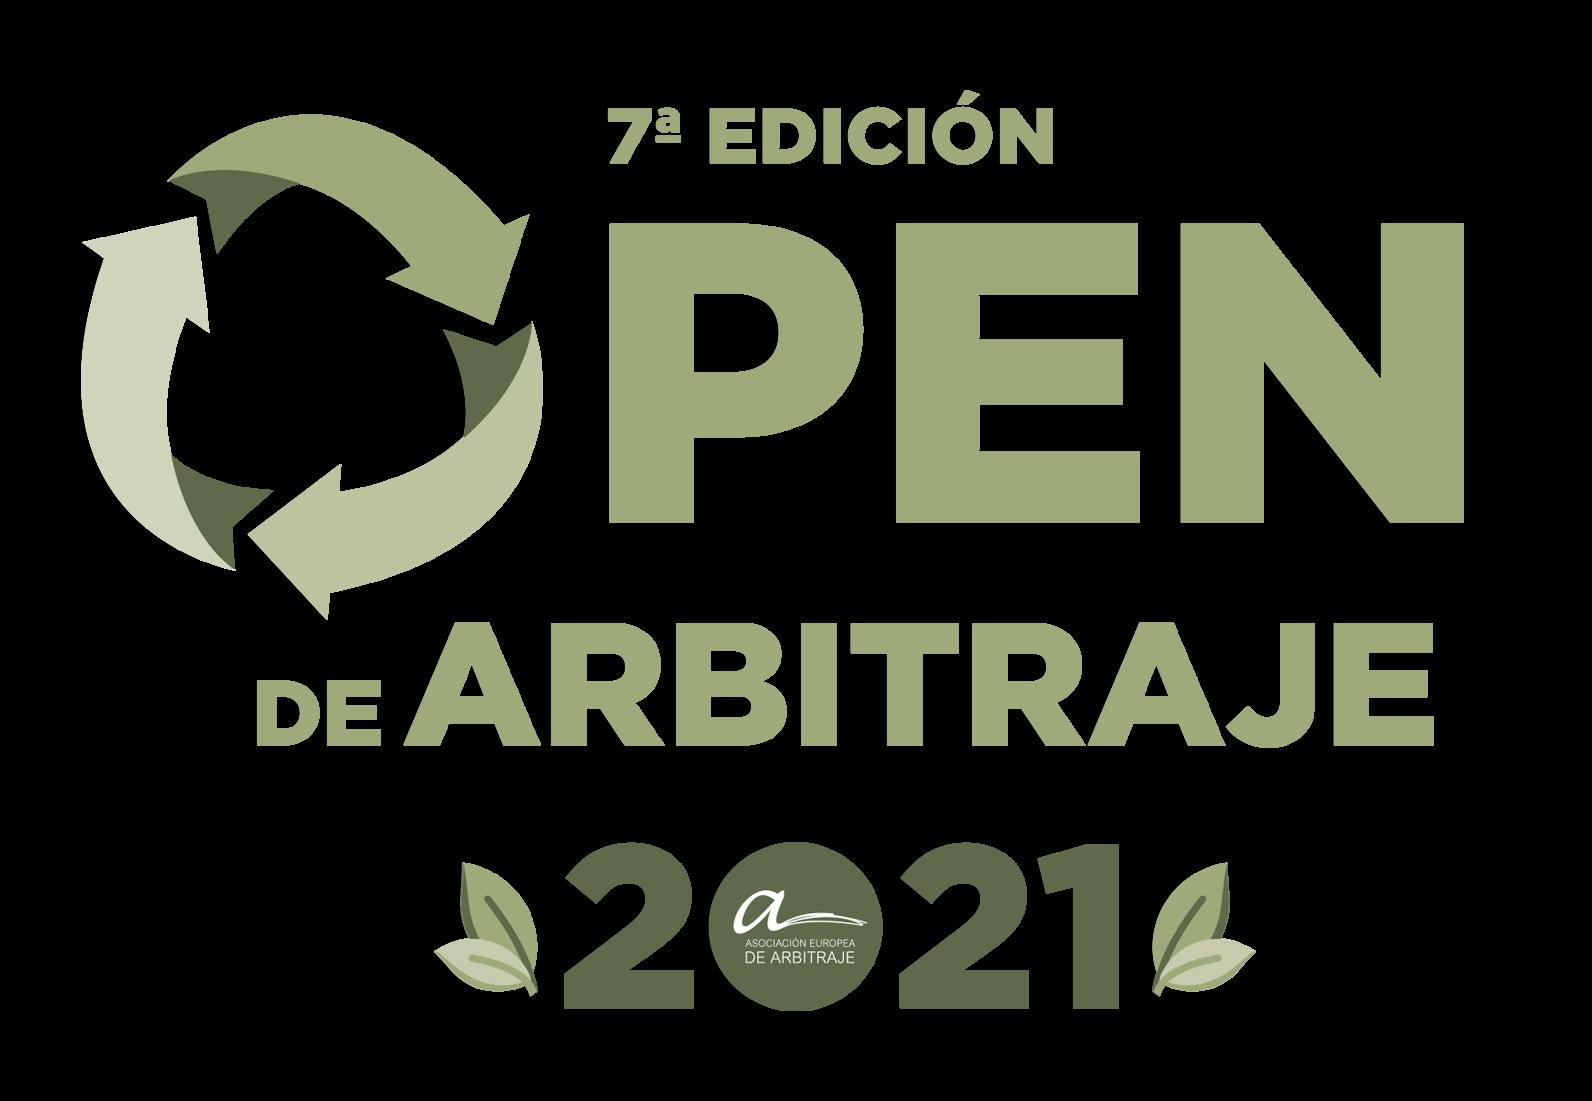 Open de Arbitraje 2021